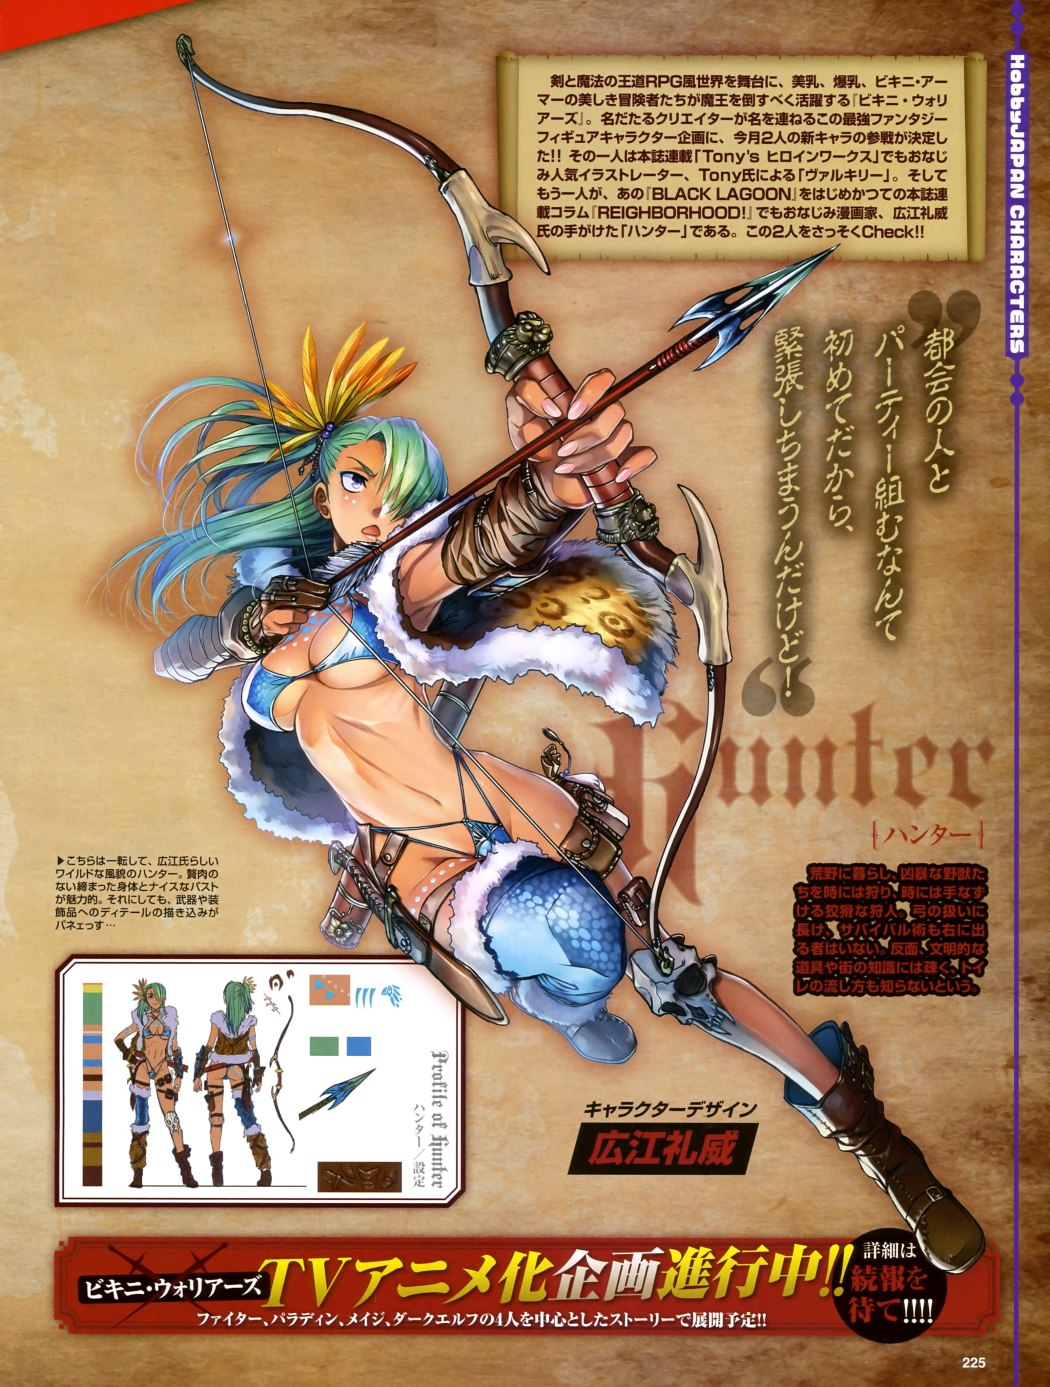 Bikini Warriors Anime Character Designs Have Major Plot 4